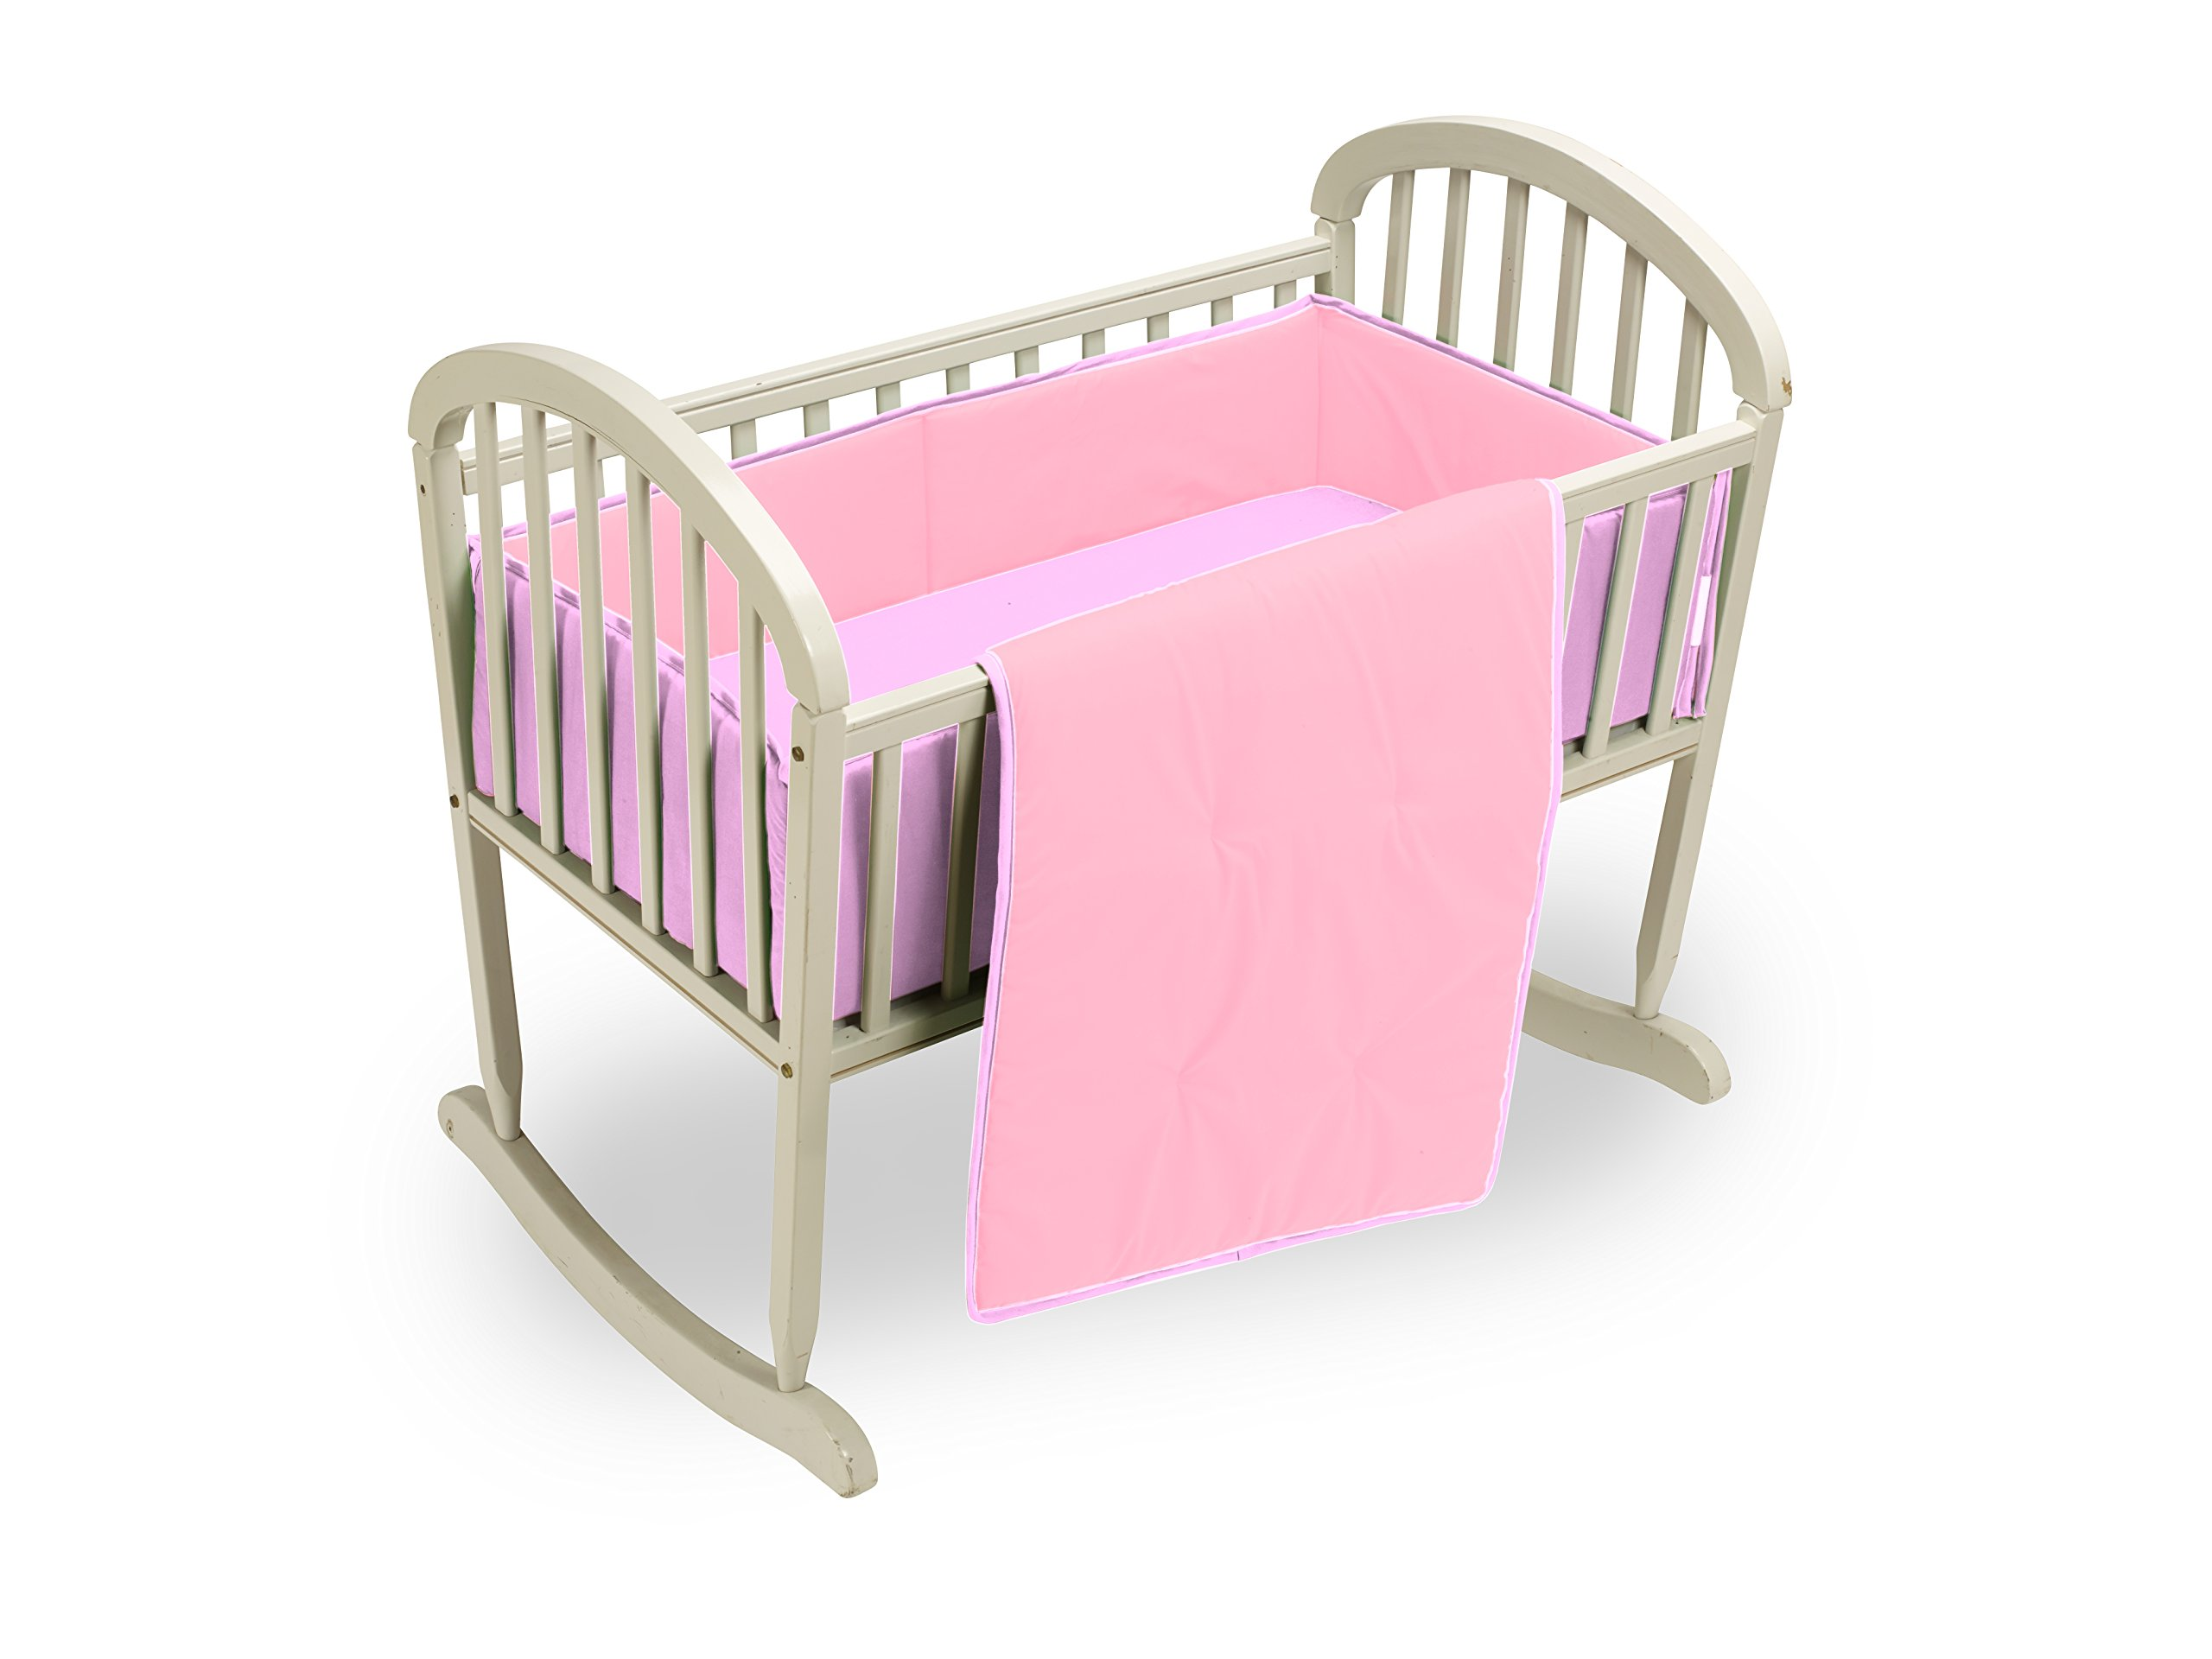 Baby Doll Bedding Reversible Cradle Bedding, Pink/Lavender